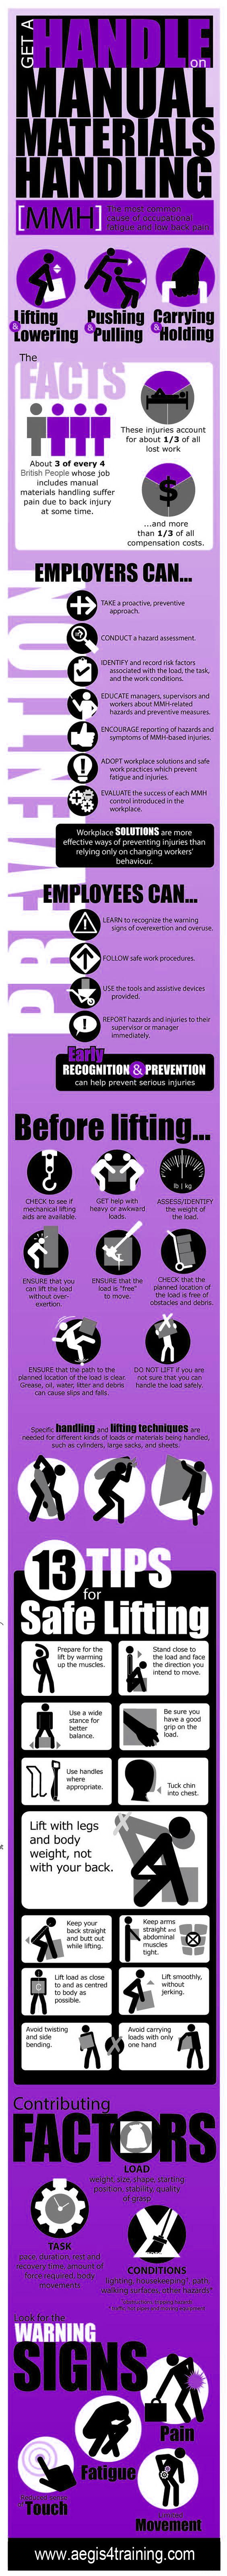 Manual Handling Safety Training